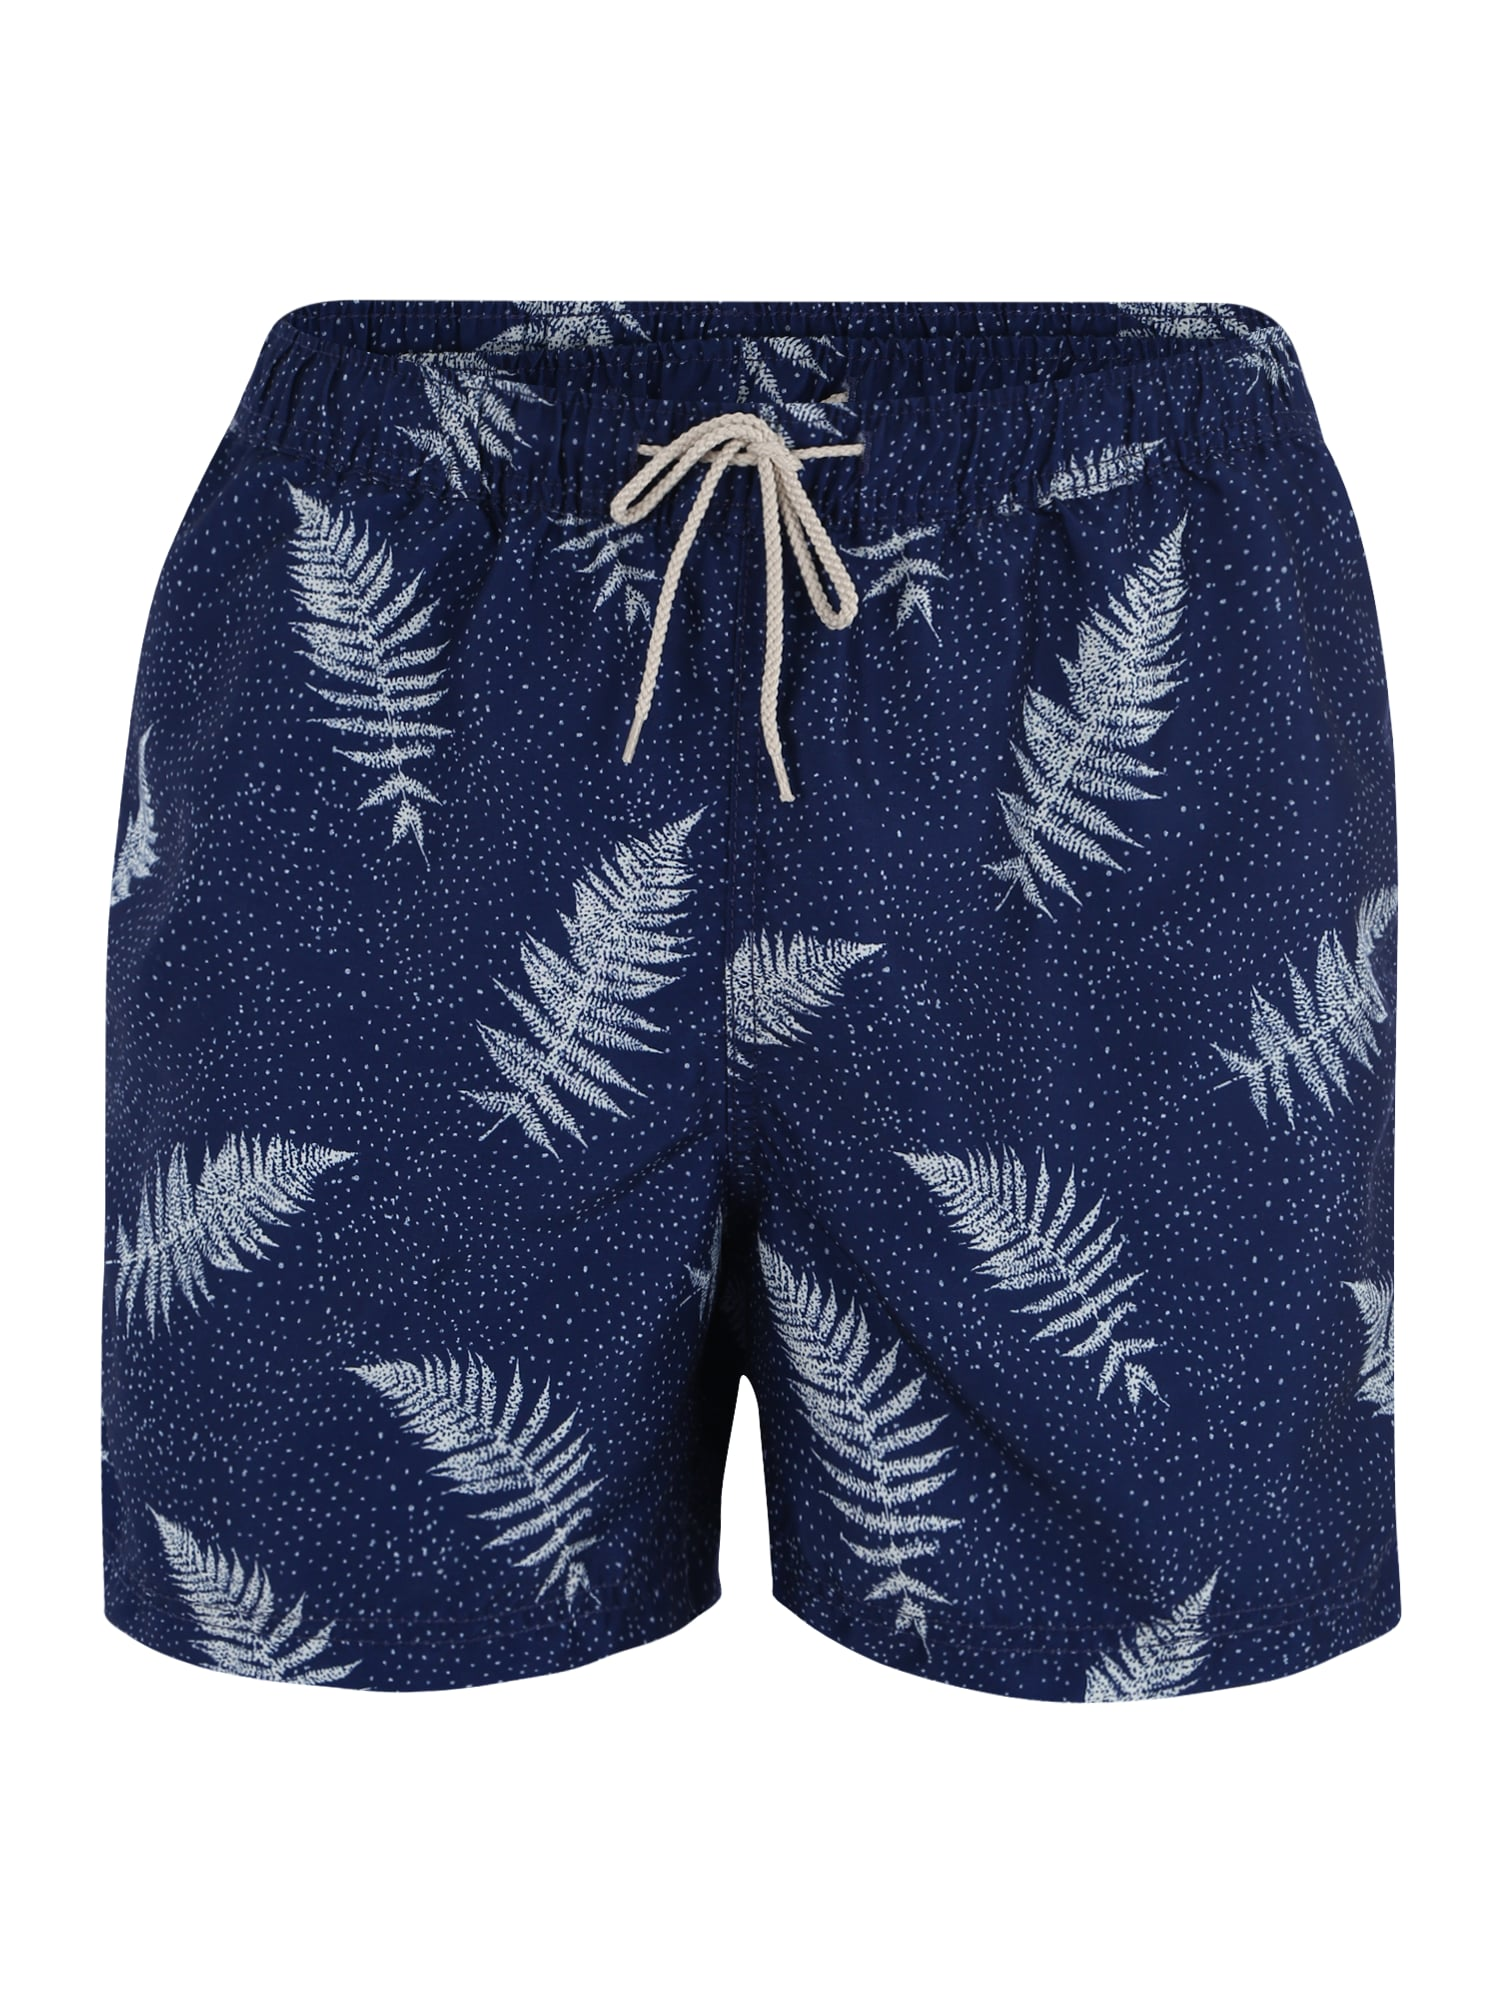 Plavecké šortky SLHCLASSIC AOP SWIMSHORTS W CITRON AOP námořnická modř mix barev SELECTED HOMME